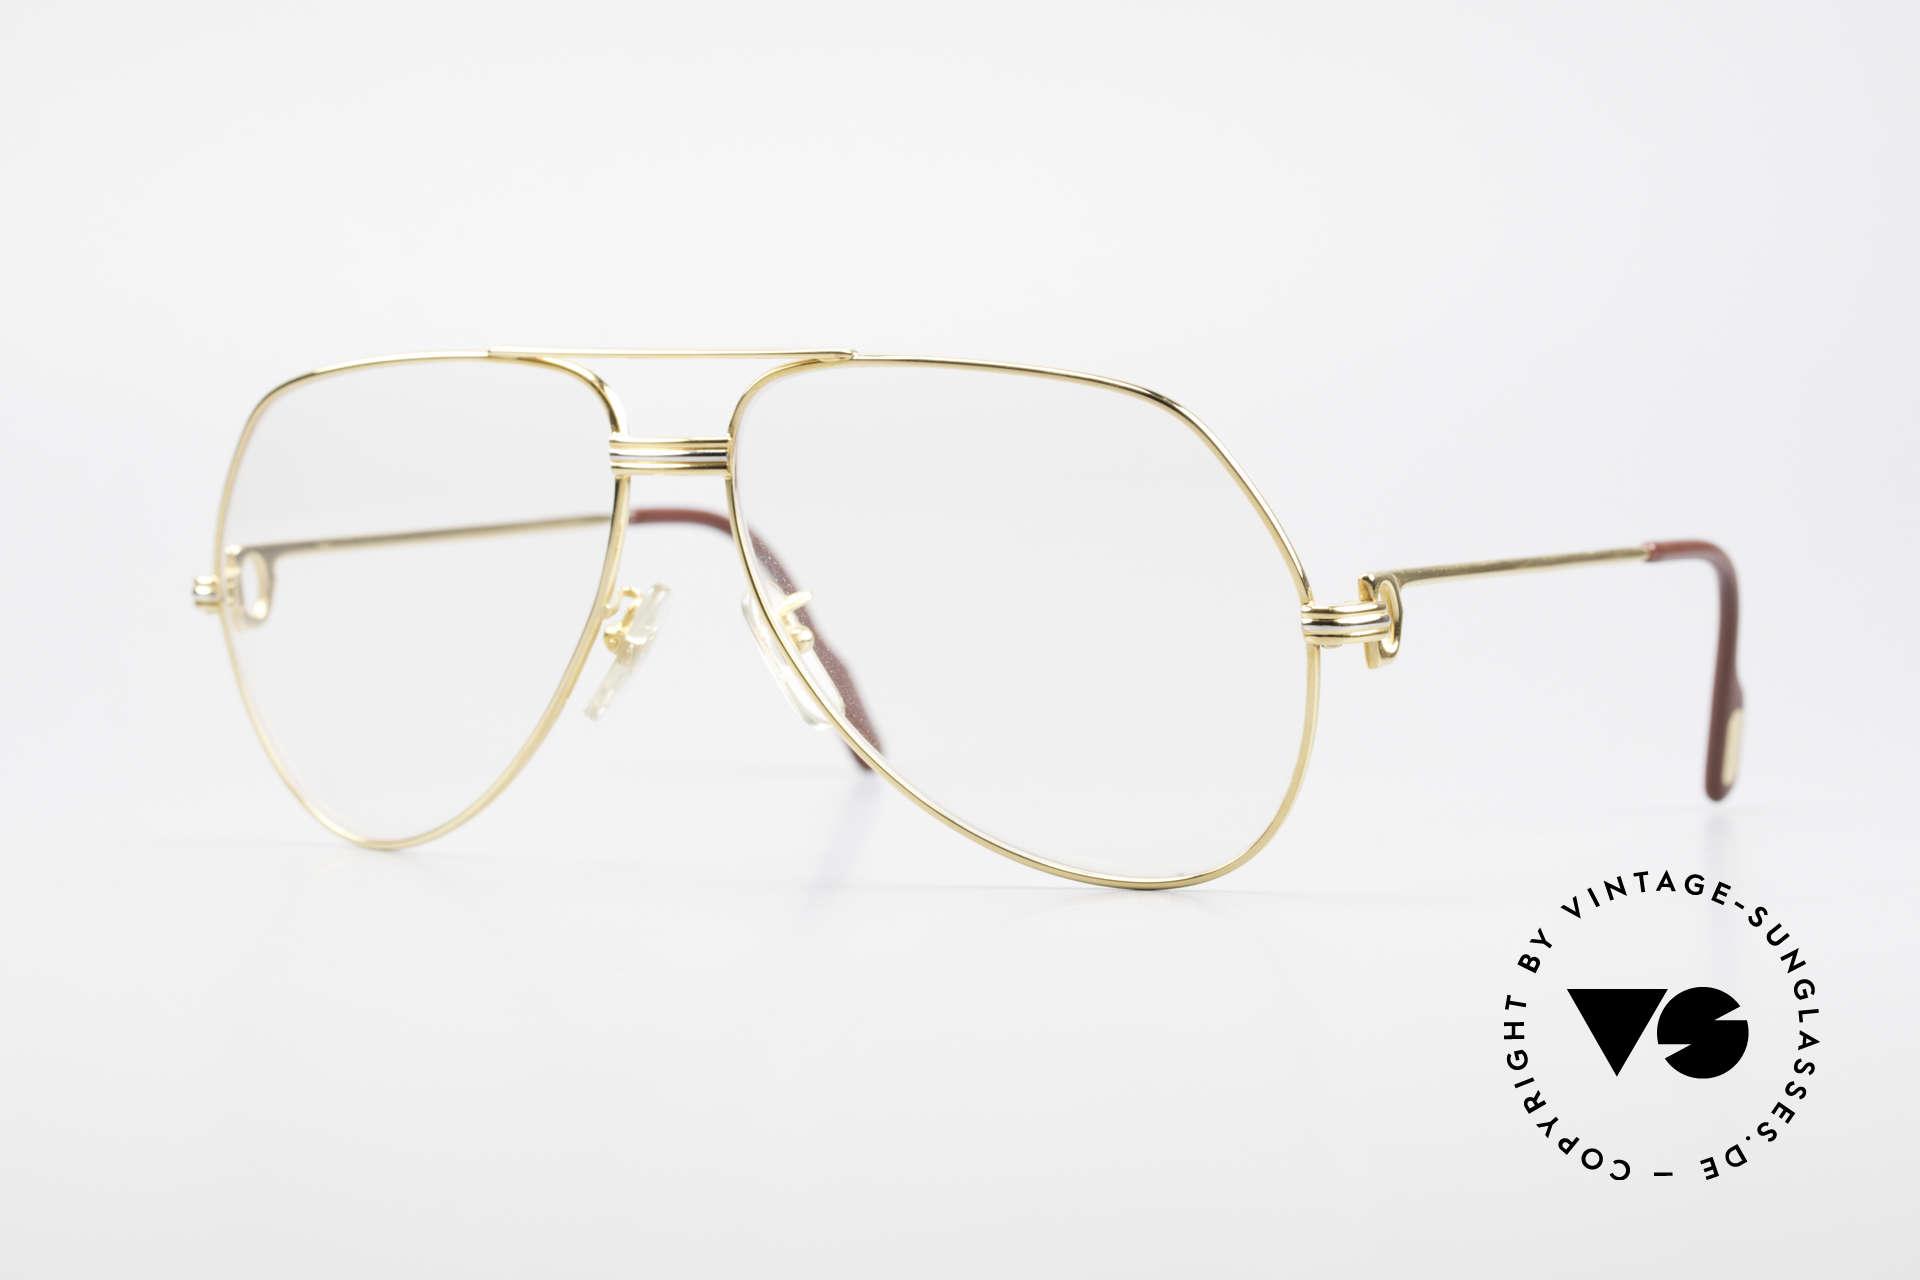 Cartier Vendome LC - L Changeable Cartier Sun Lenses, Vendome = the most famous eyewear design by CARTIER, Made for Men